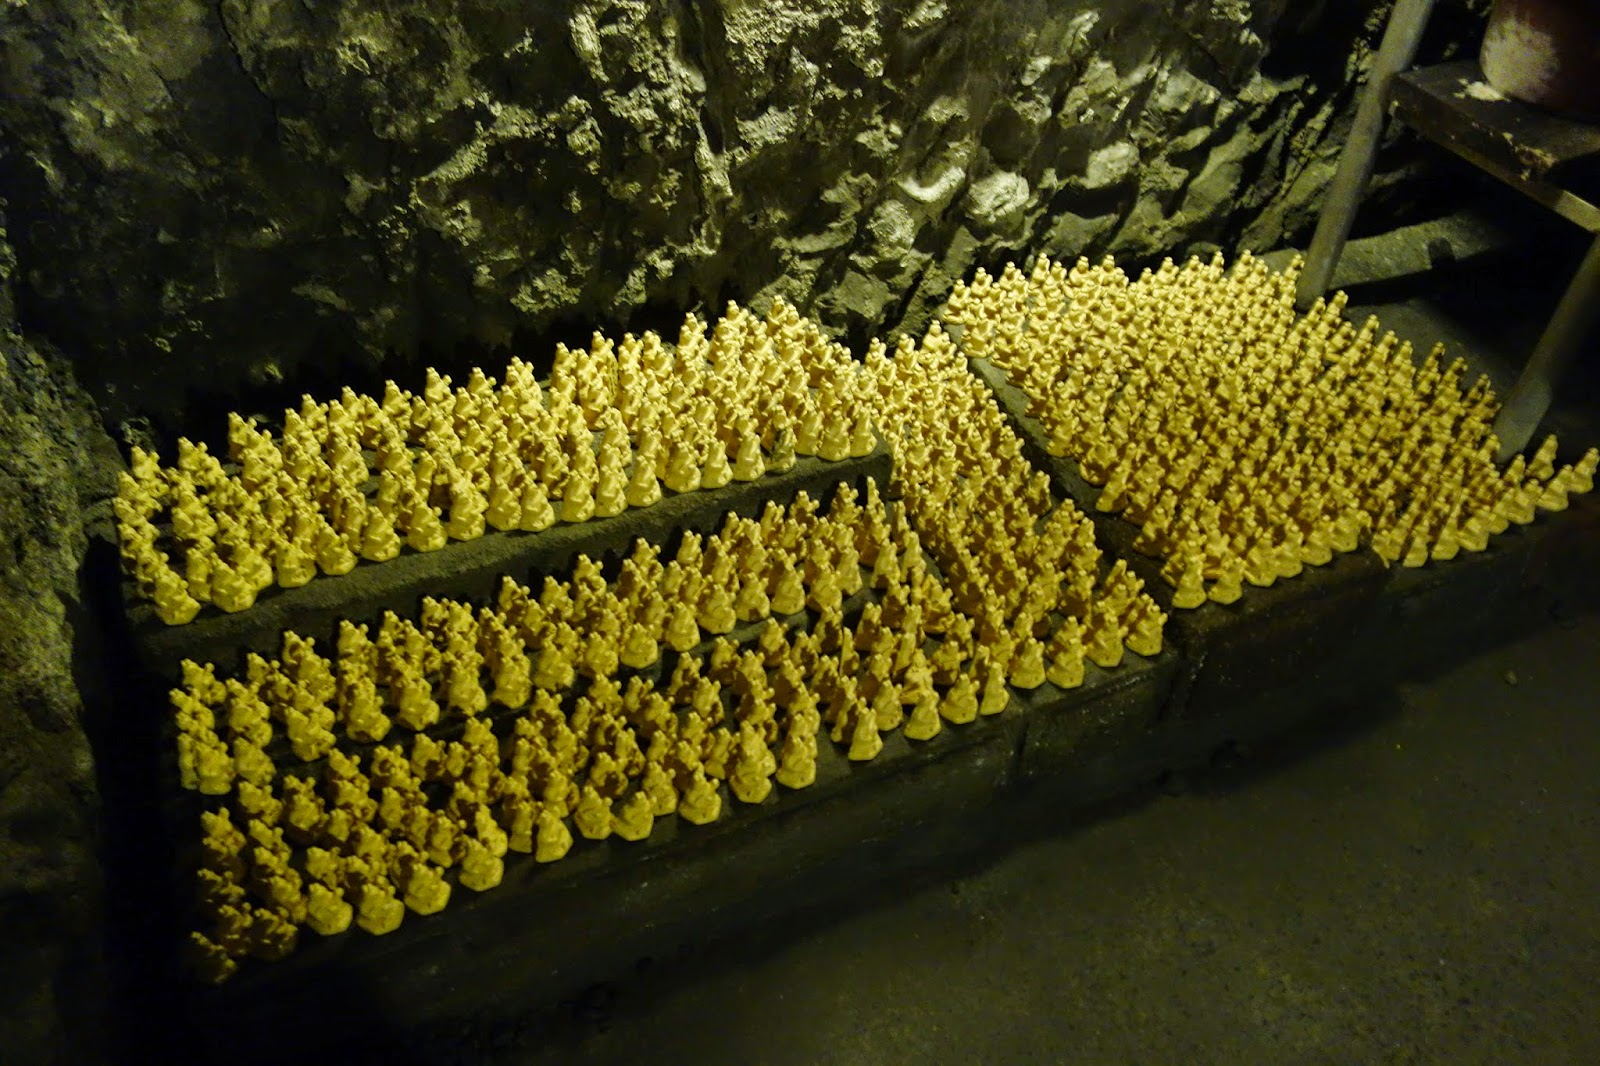 Hasedera 長谷寺 temple Hase Temple kamakura japan tour trip cave benzaiten